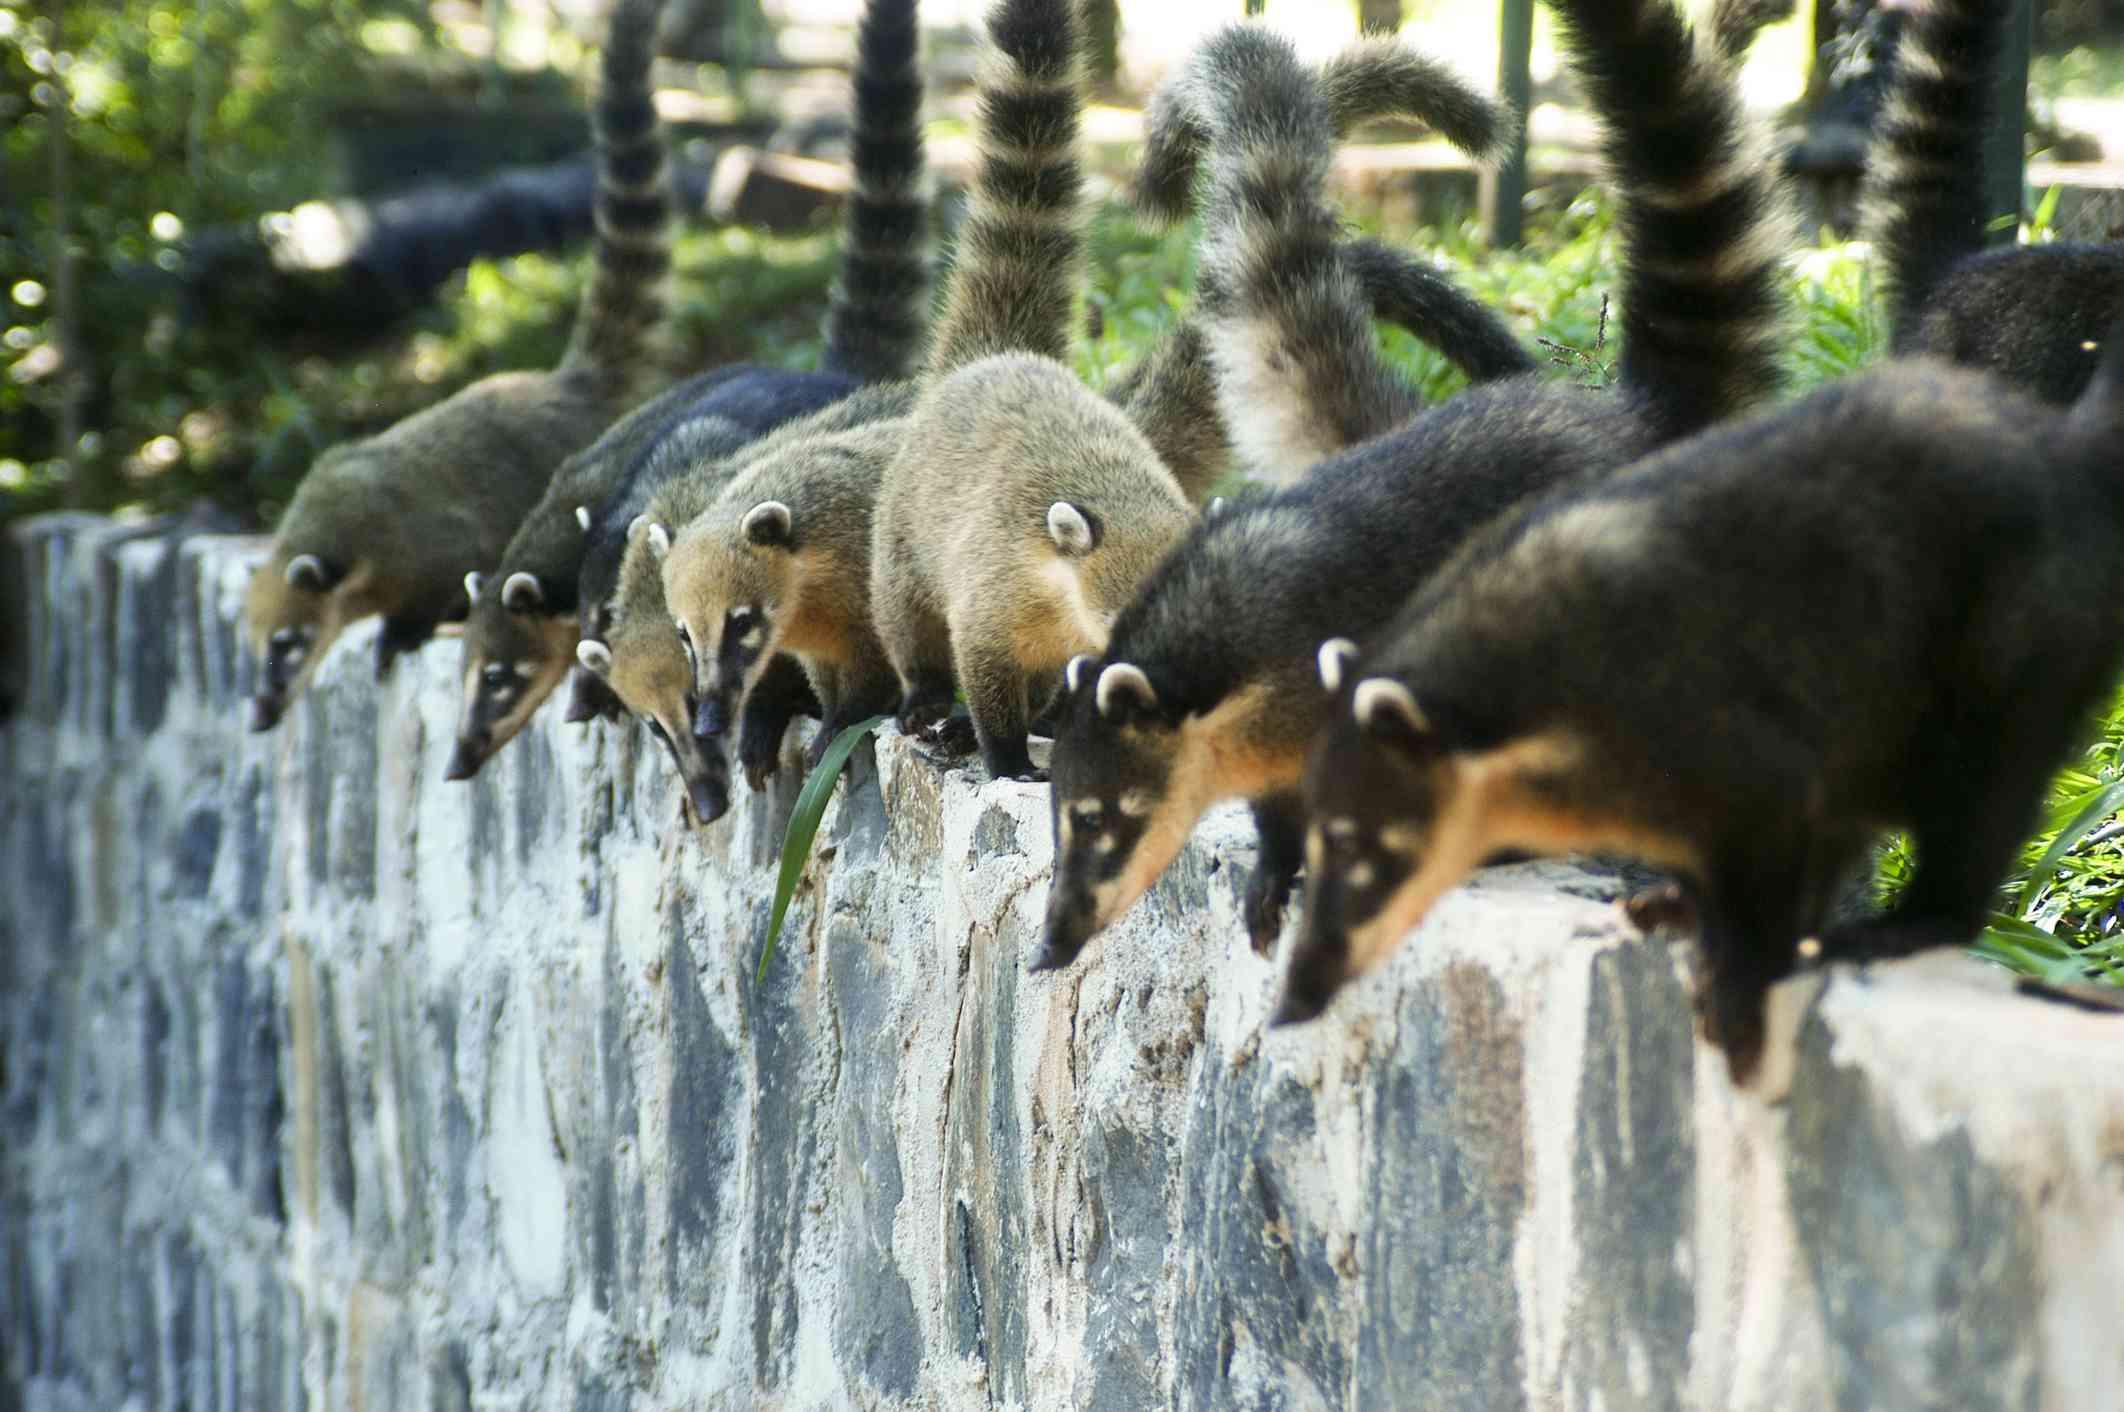 A band of coatimundi at Iguaçu Fall National Park, Brazil.